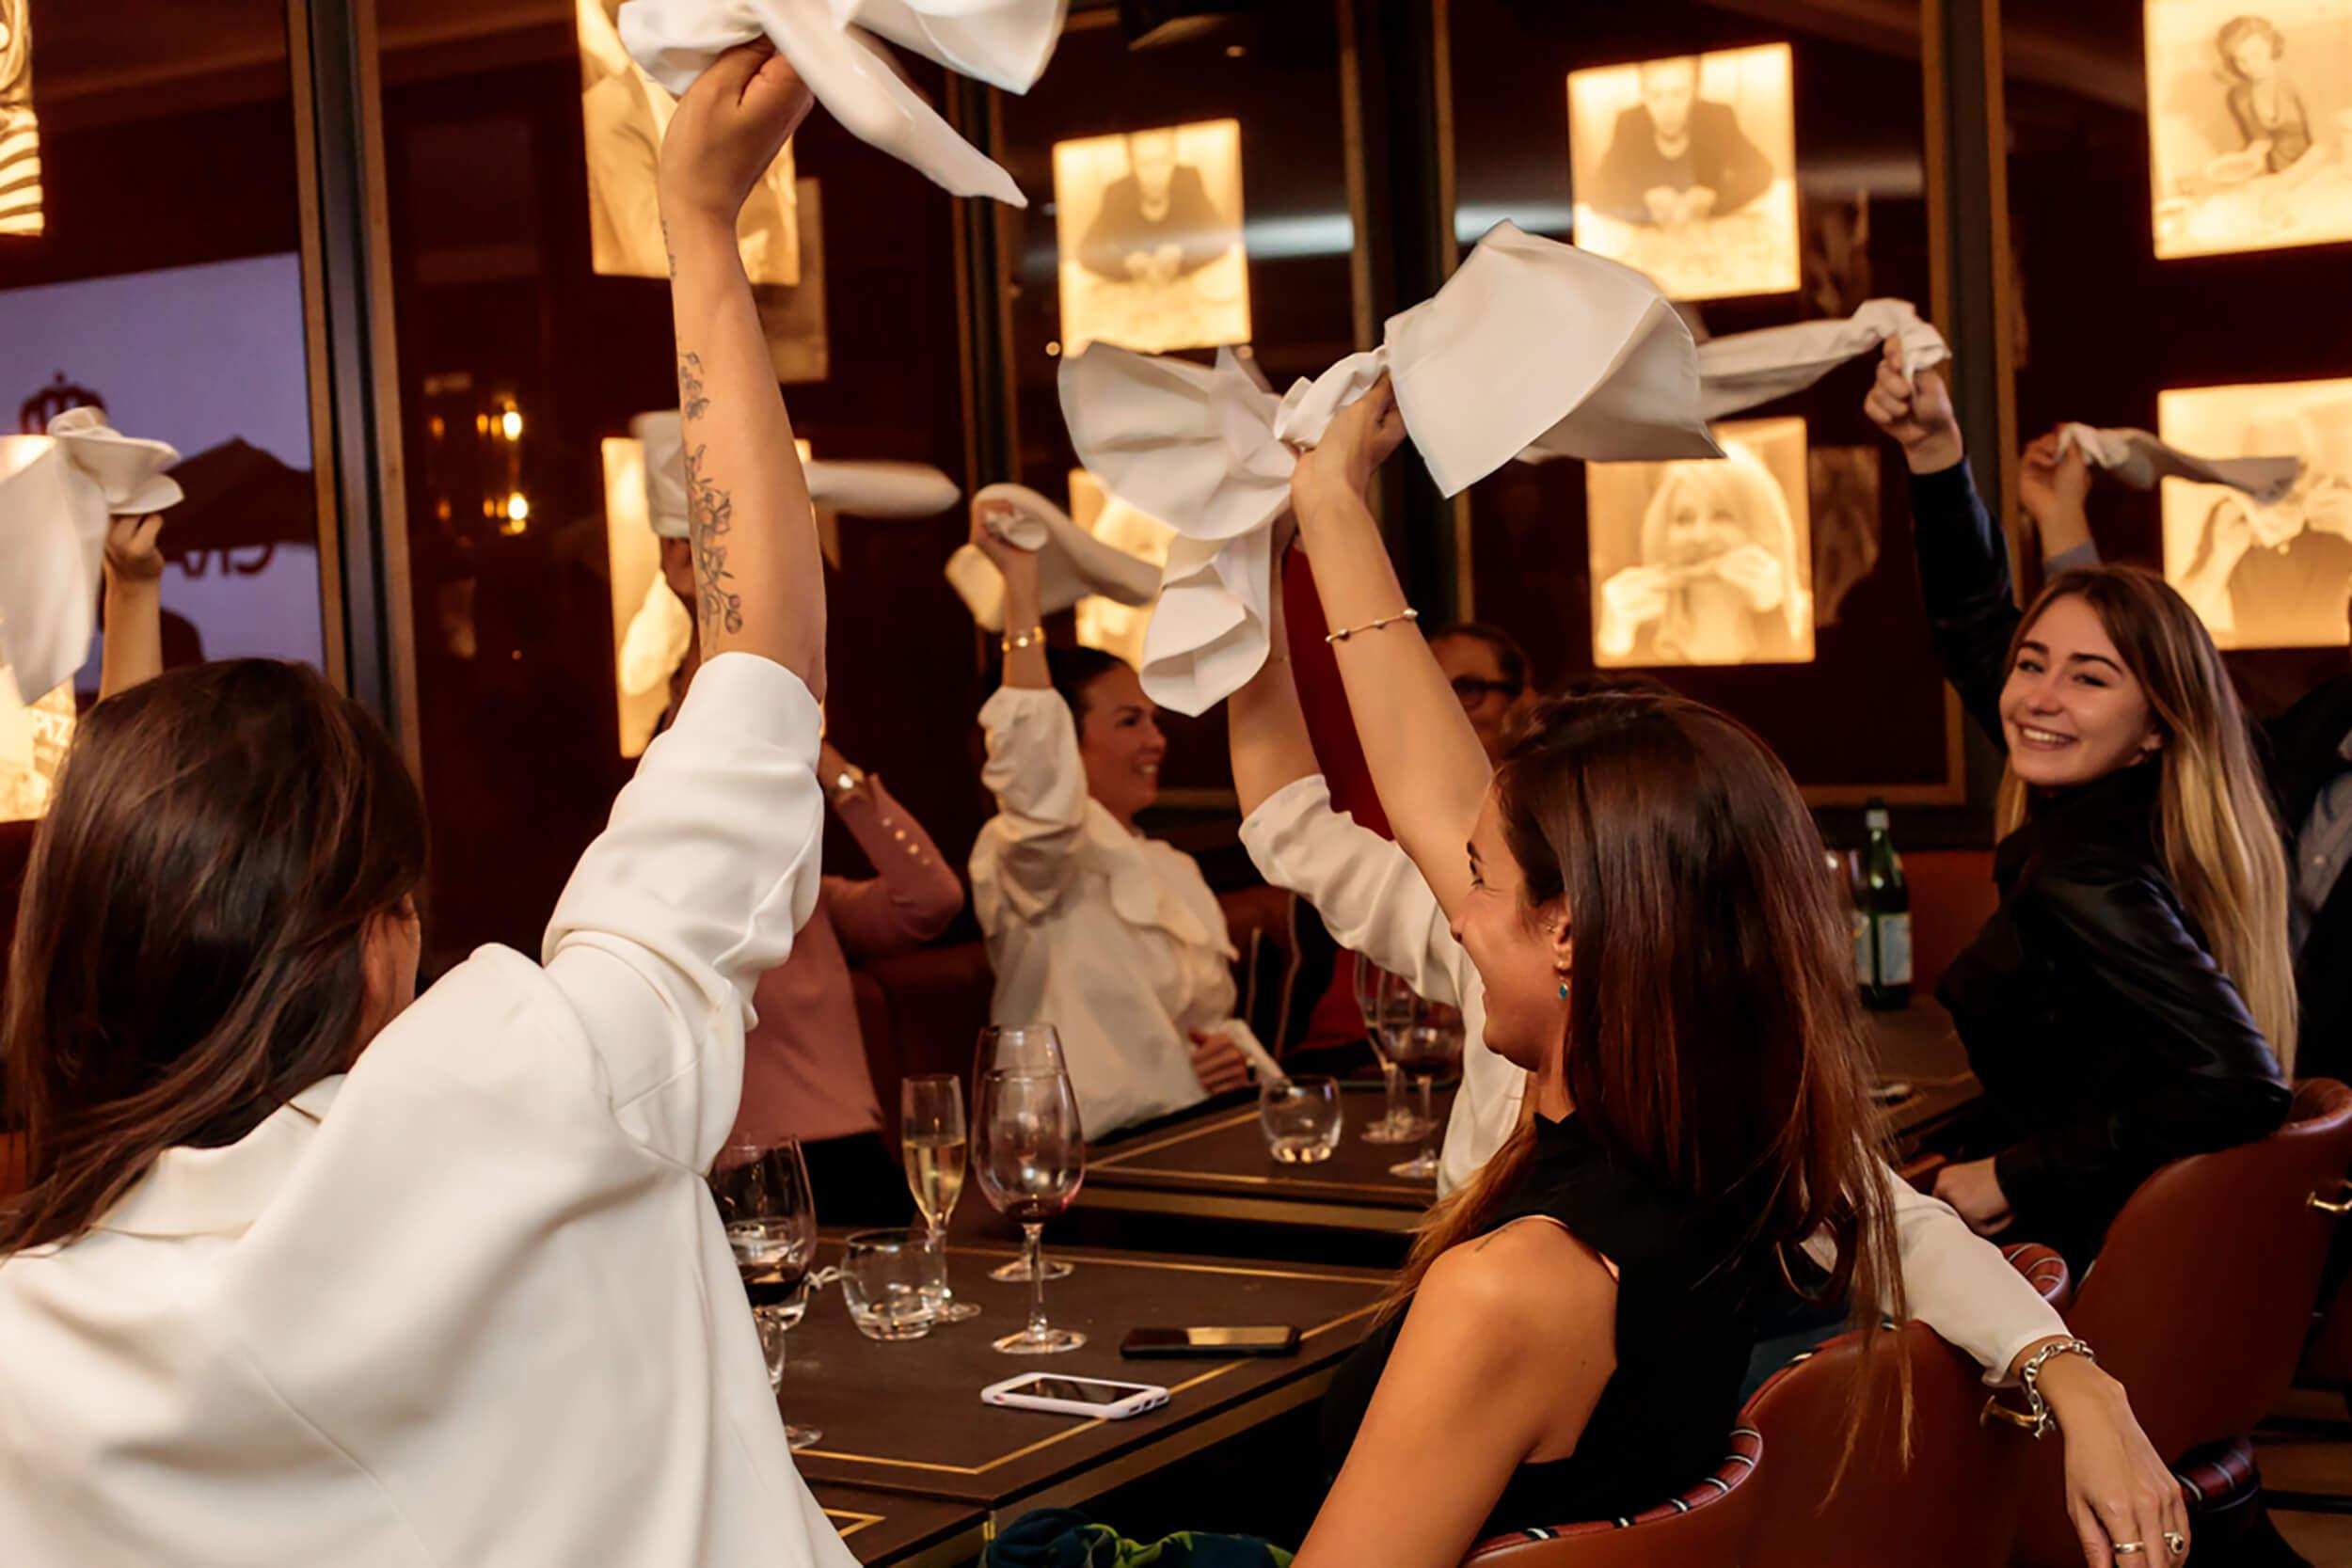 Guests swinging napkins.